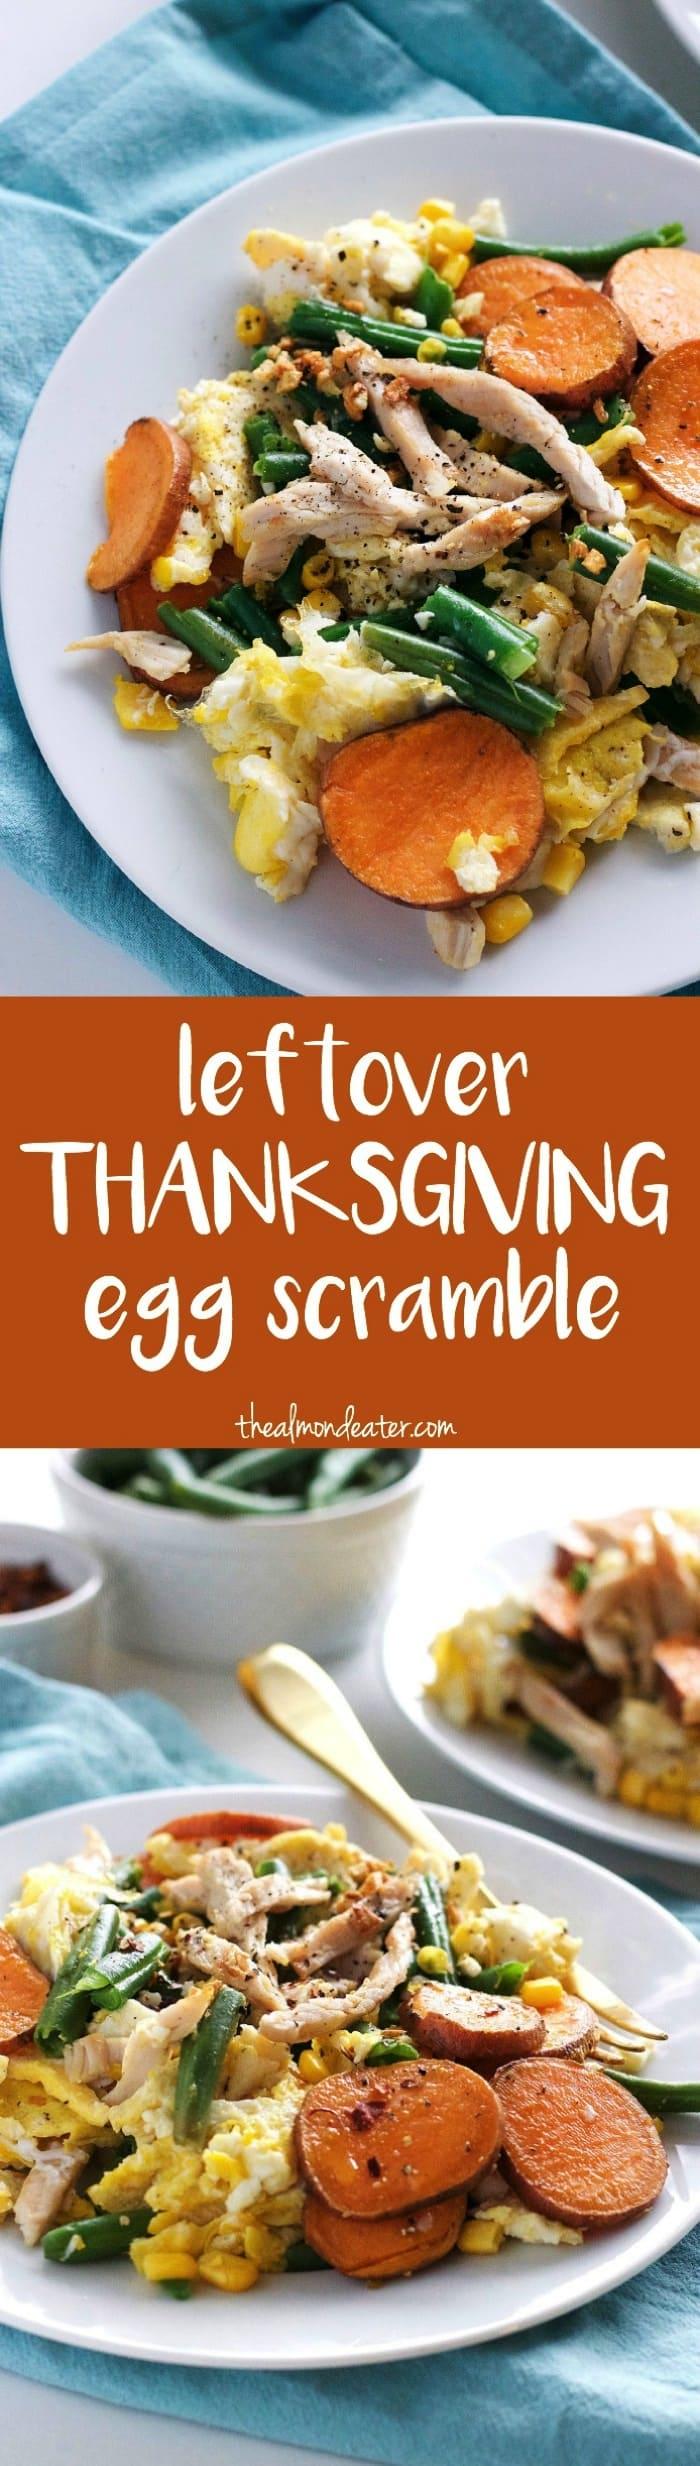 Leftover Thanksgiving Egg Scramble